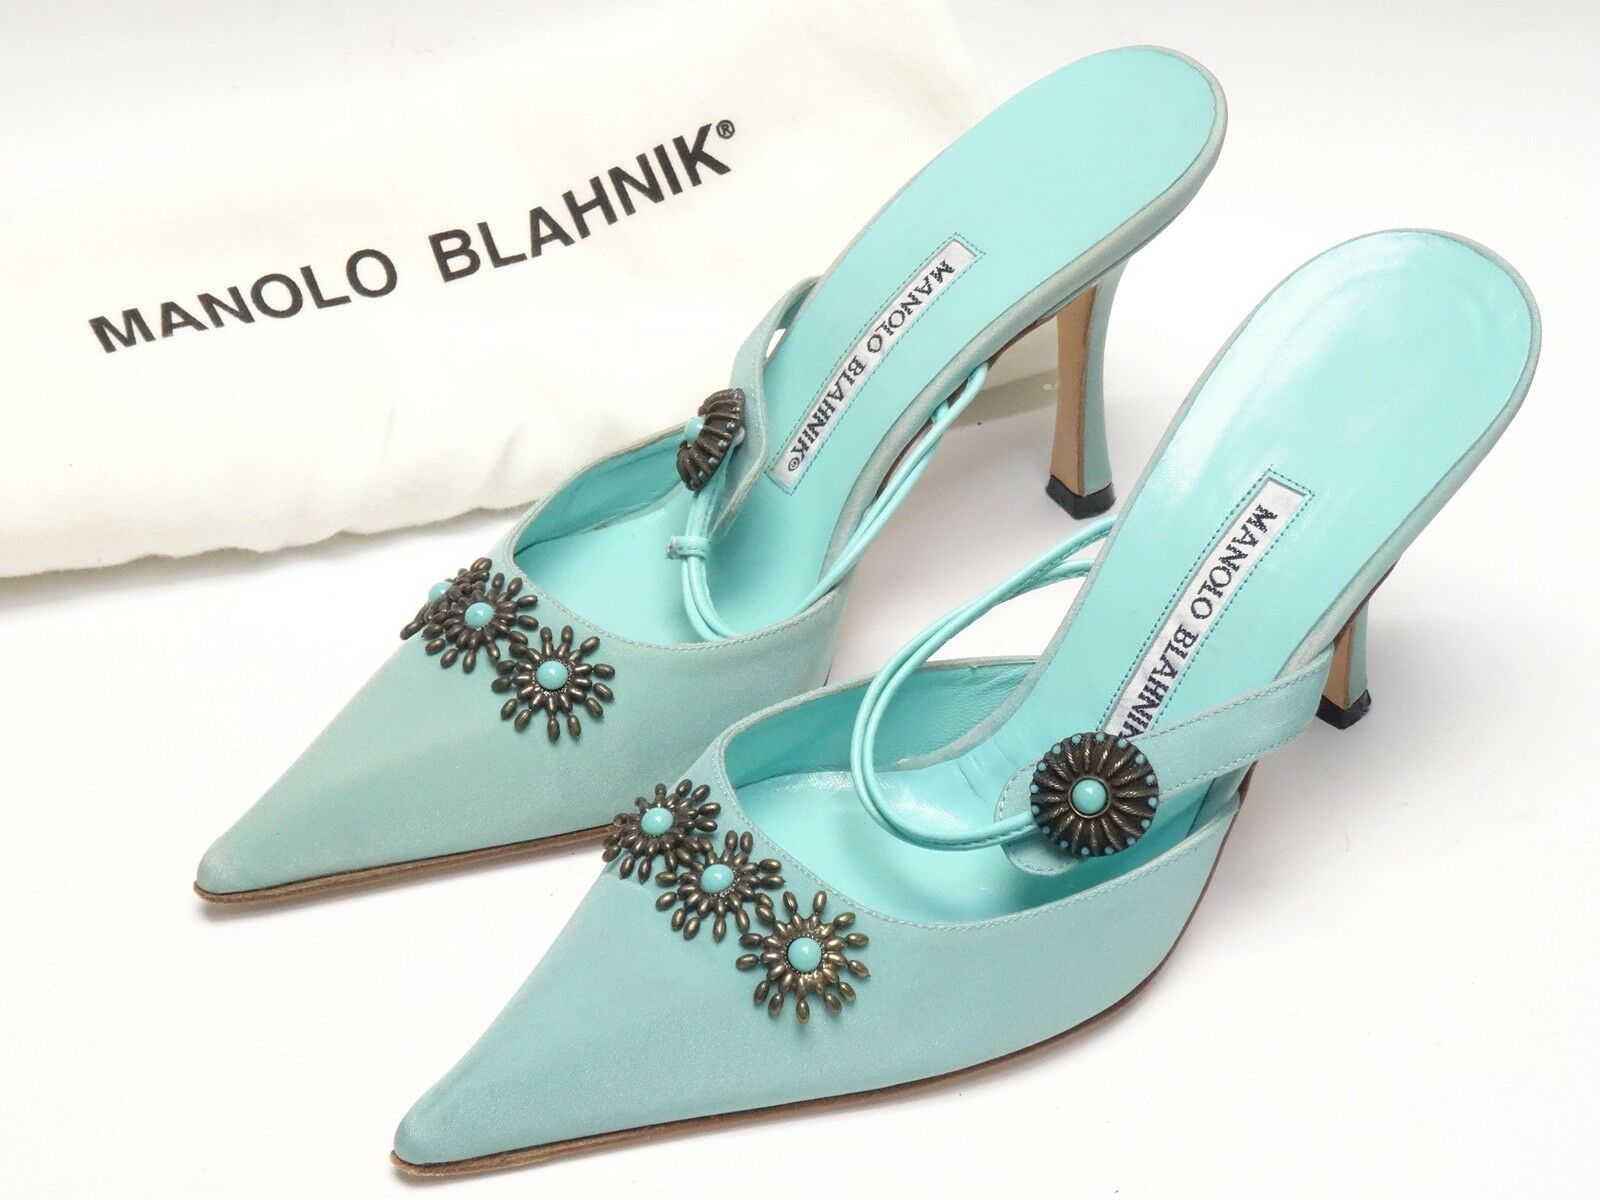 High Fashion Manolo Blahnik Tacones satén de imitación turquesa joyas joyas joyas bomba zapatos talla 38  clásico atemporal